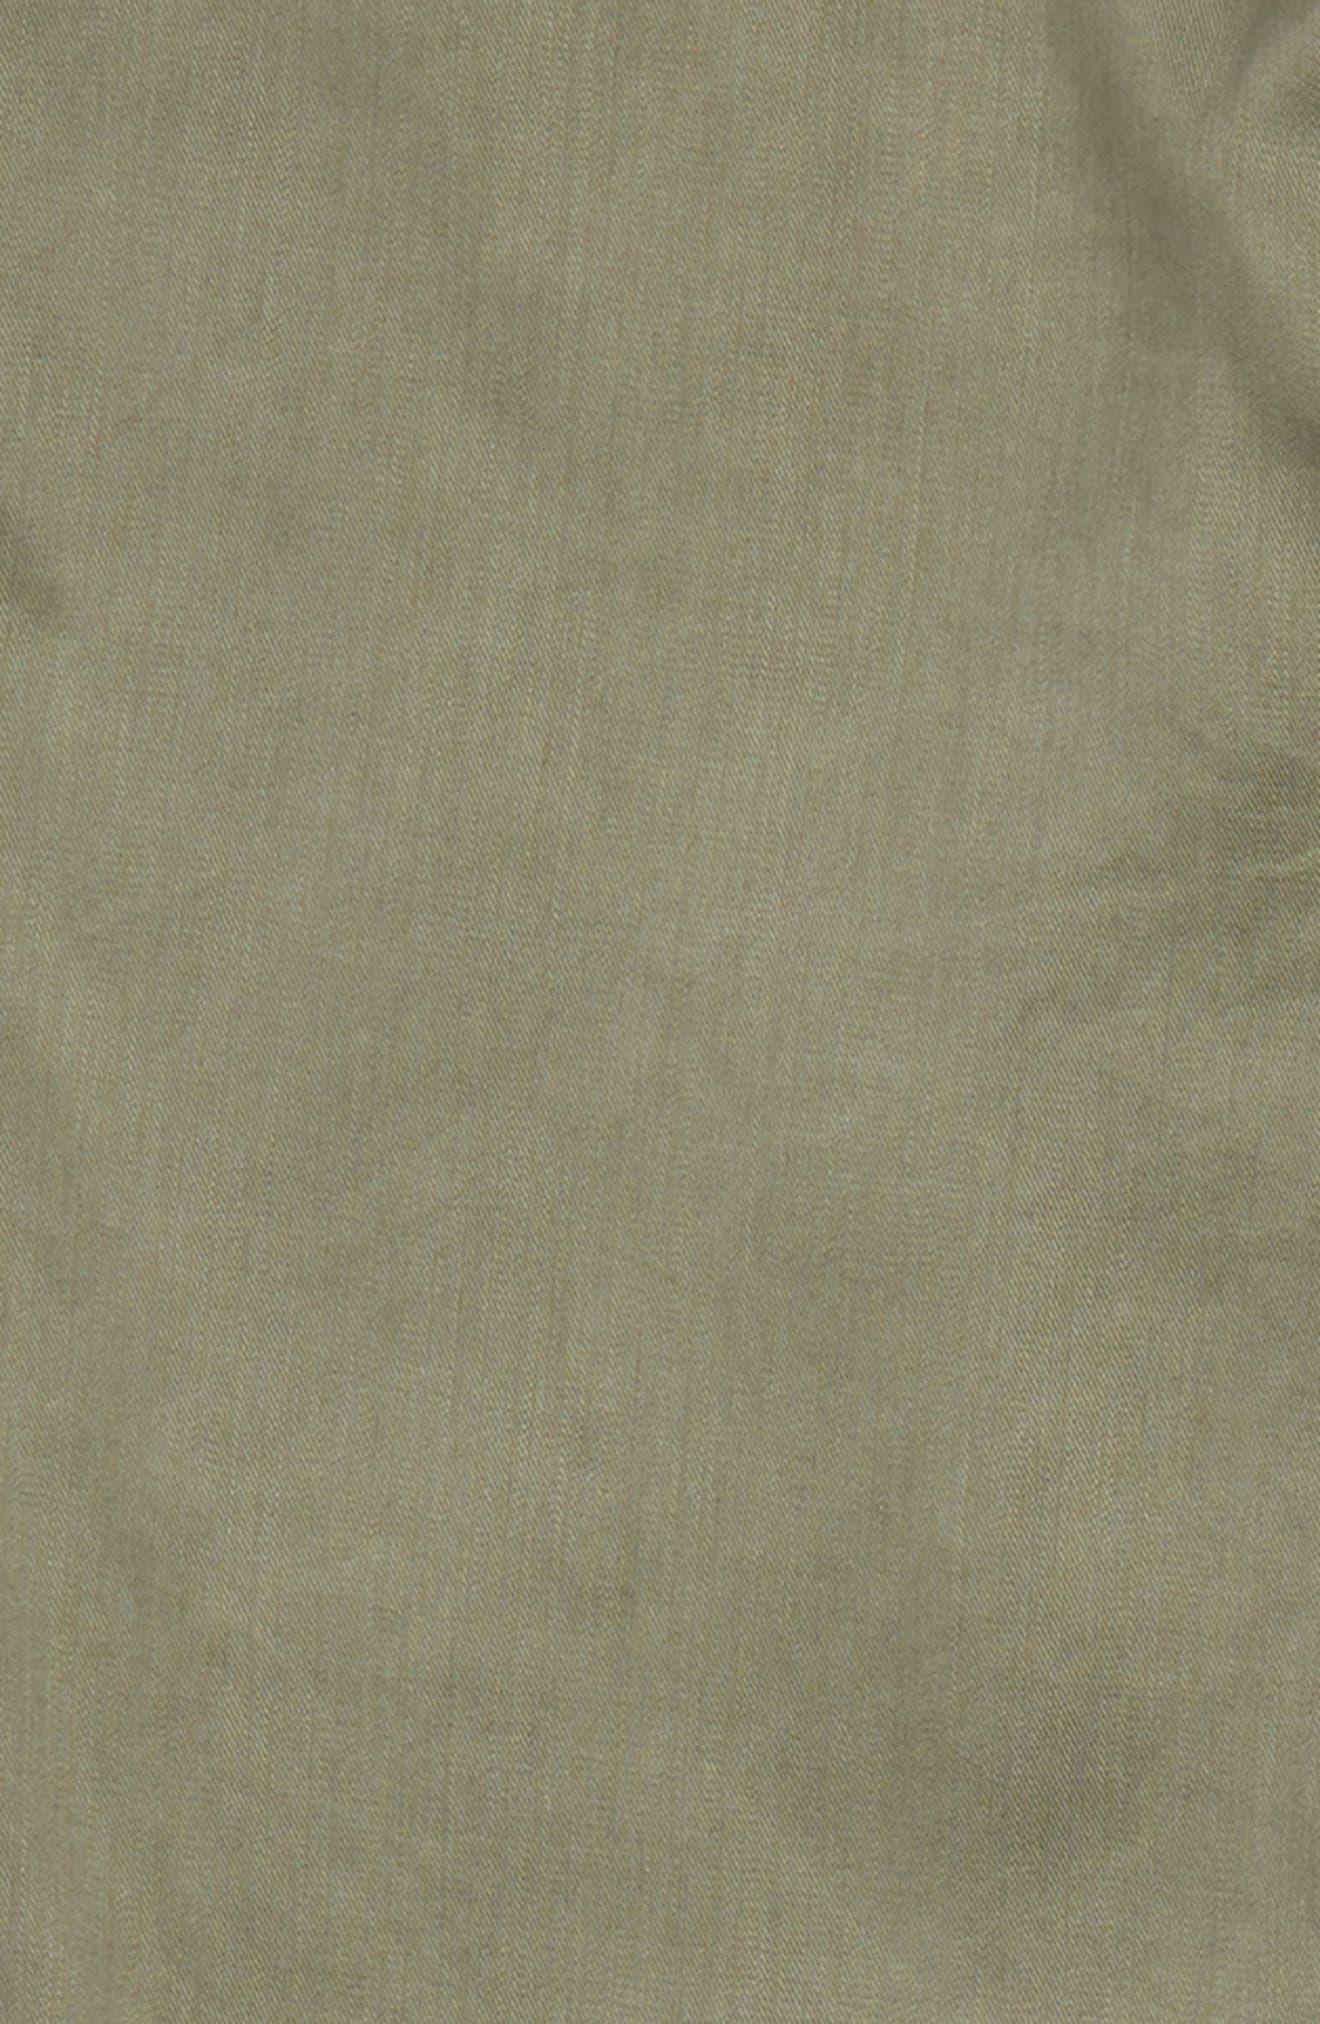 Woven Jogger Pants,                             Alternate thumbnail 3, color,                             311